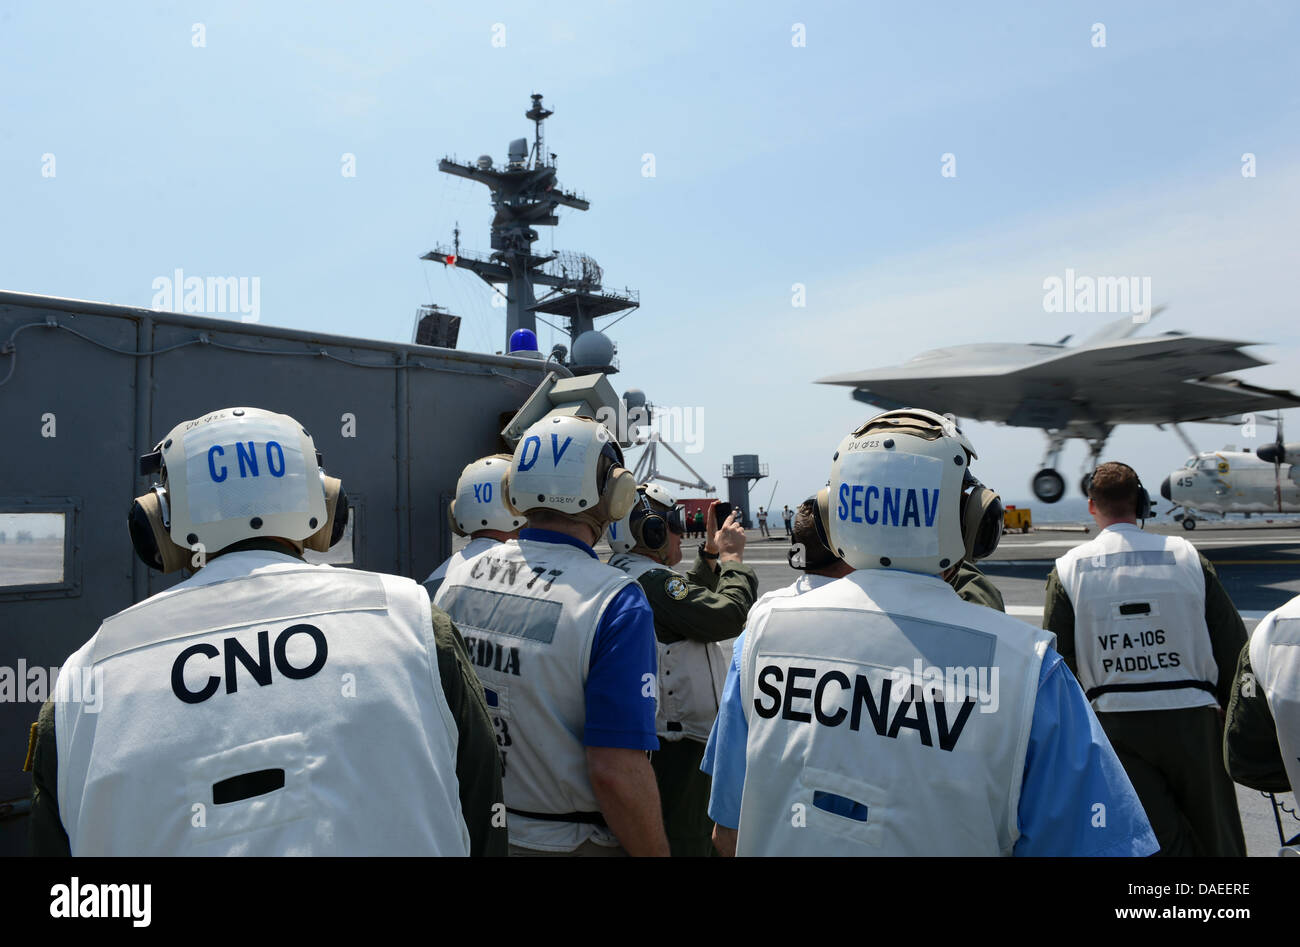 Chief of Naval Operations Adm. Jonathan Greenert, left, and Secretary of the Navy Ray Mabus watch a US Navy X-47B Stock Photo